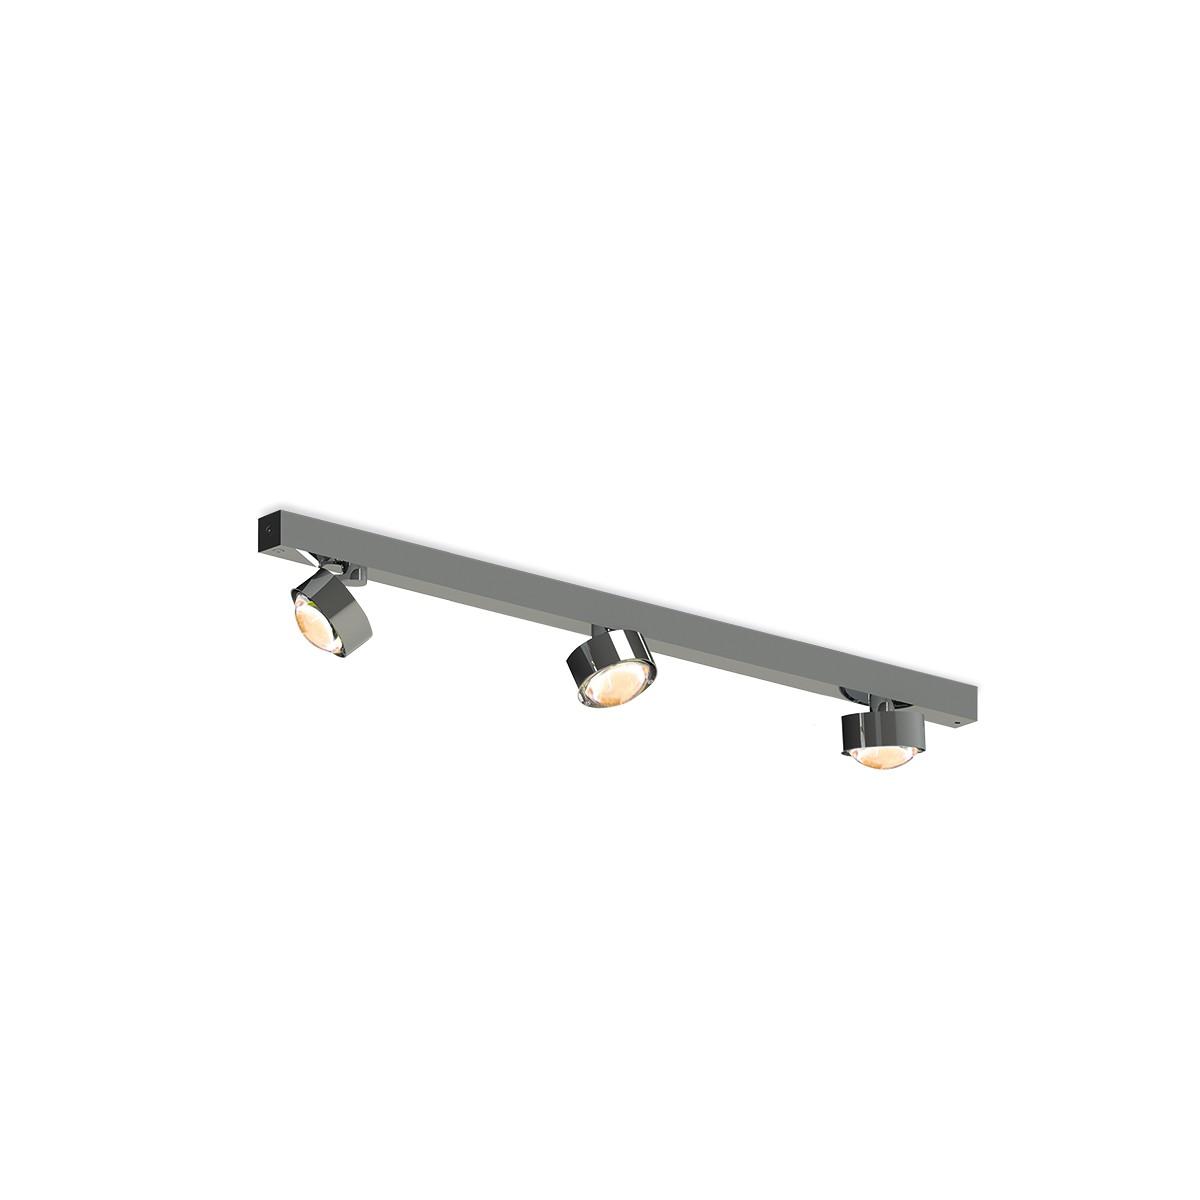 Top Light Puk Choice Move Deckenleuchte, 85 cm